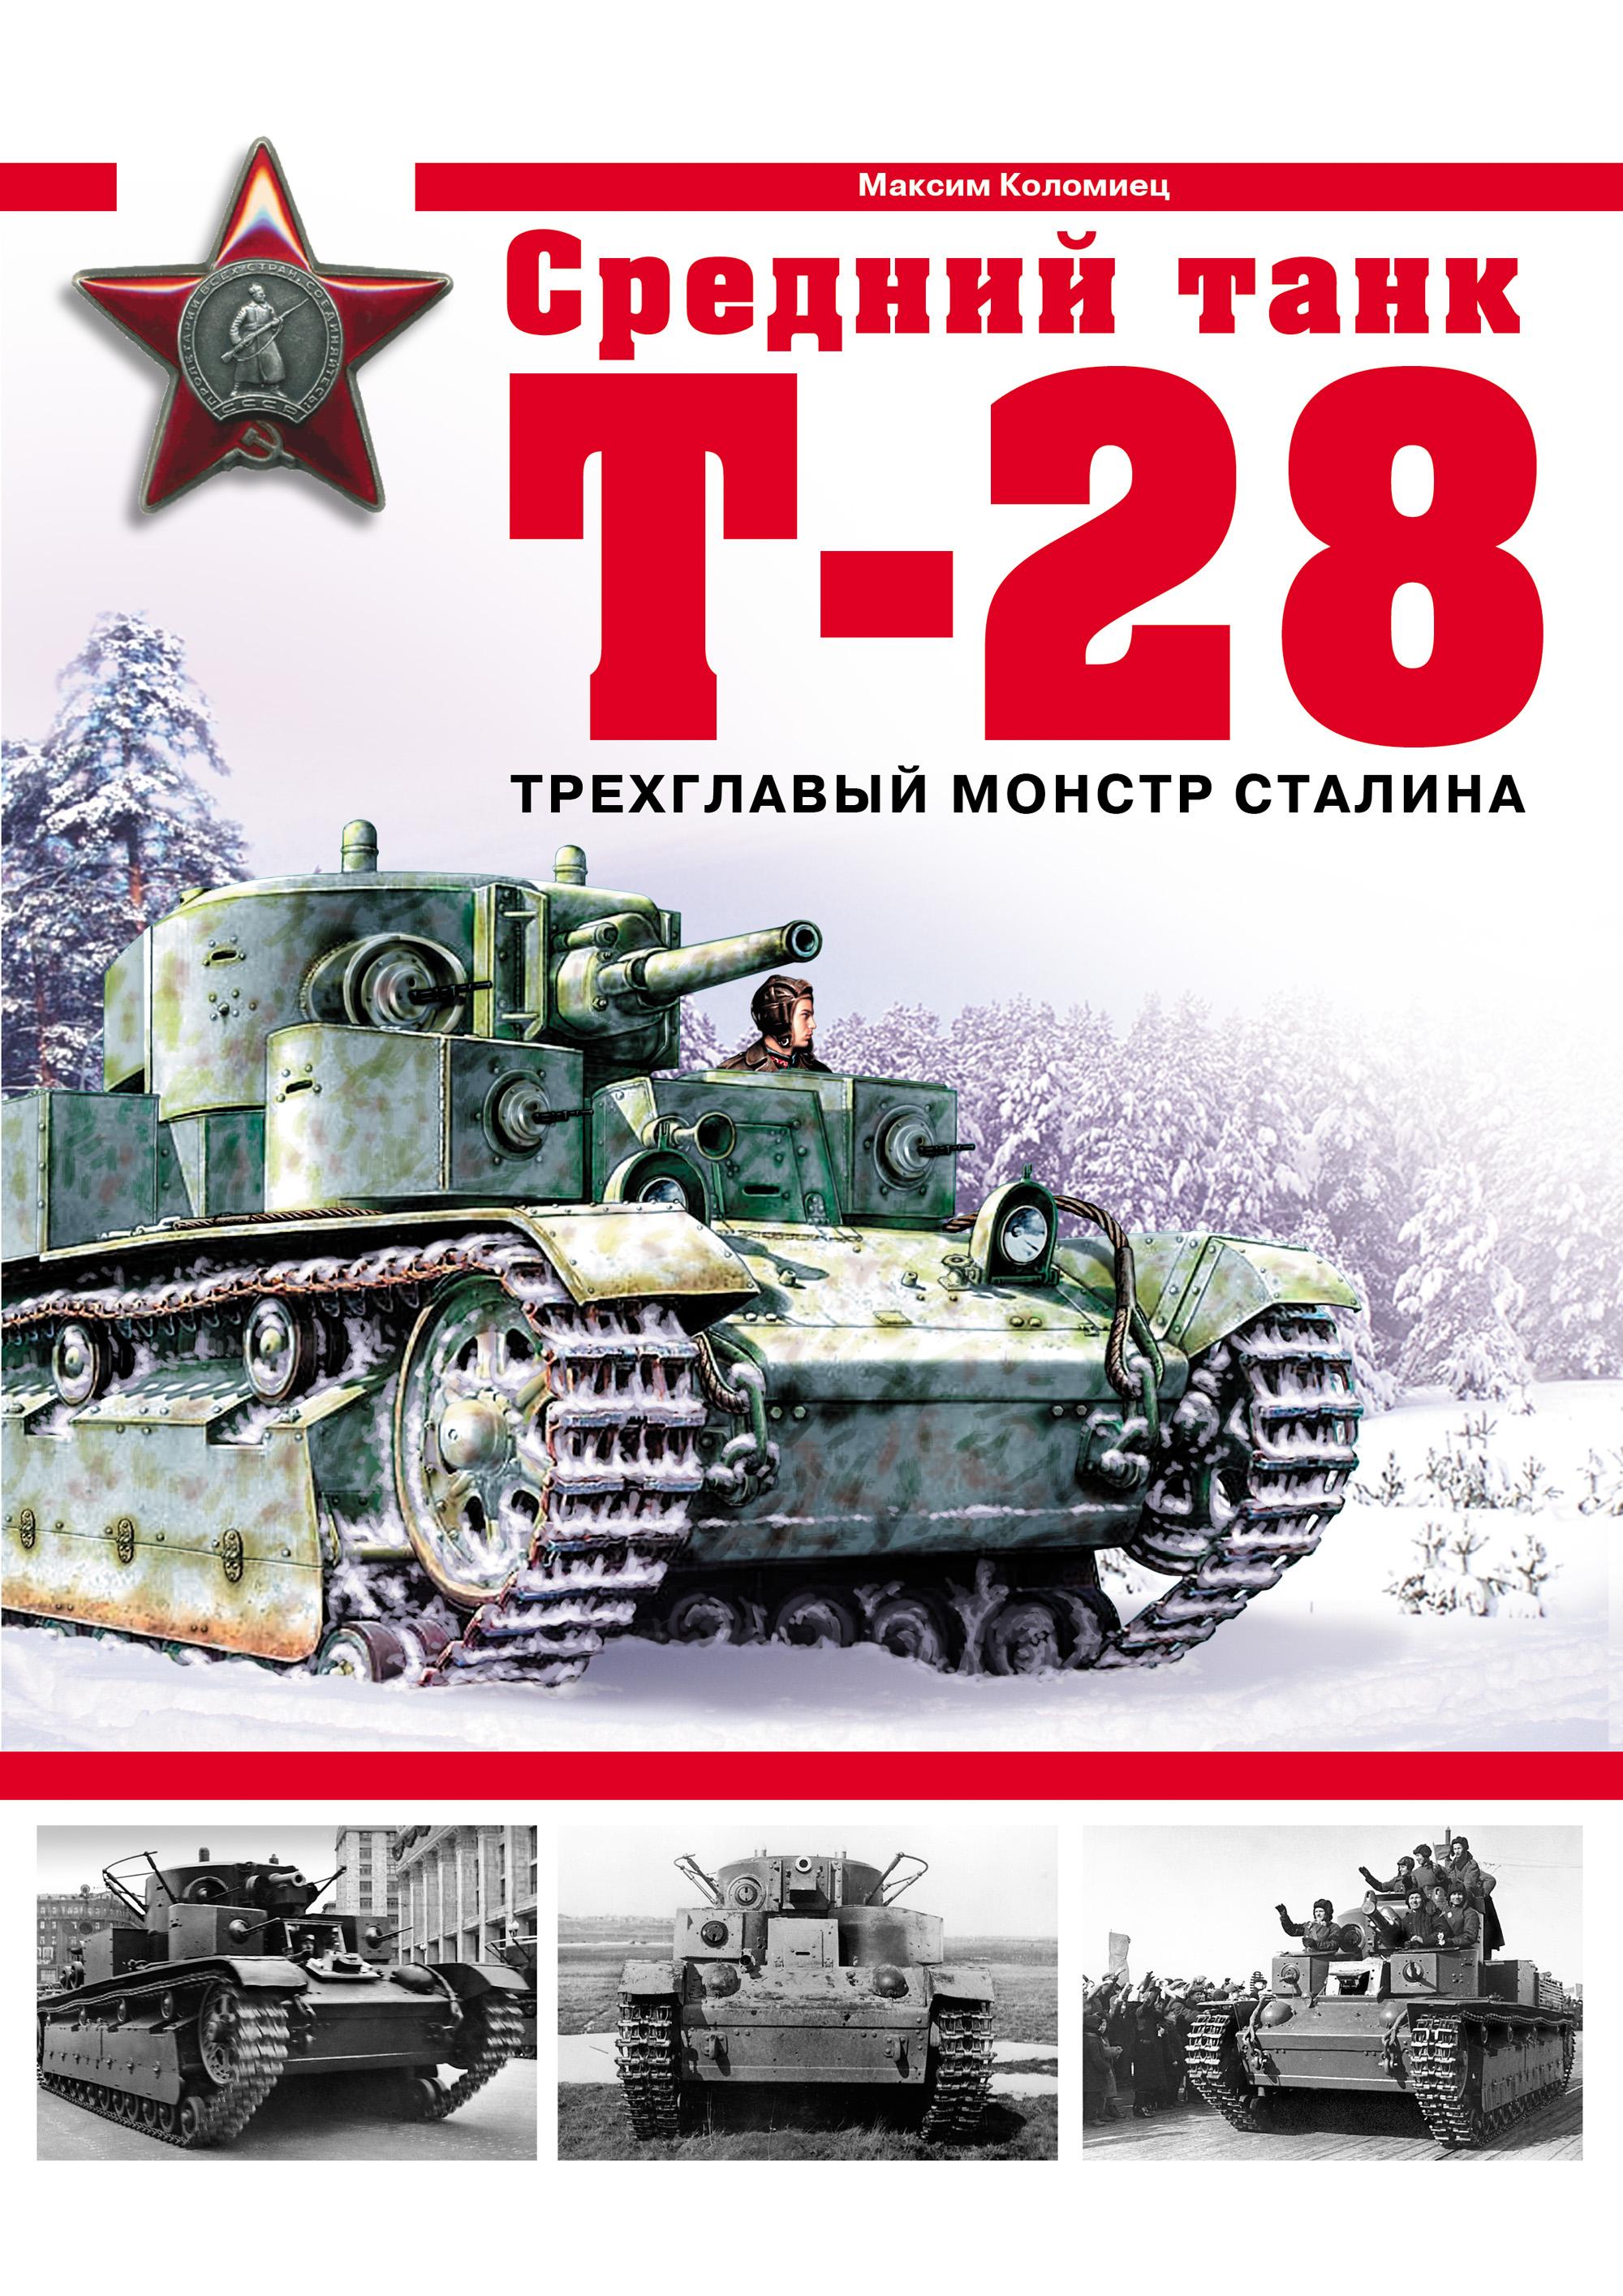 Максим Коломиец Средний танк Т-28. Трехглавый монстр Сталина